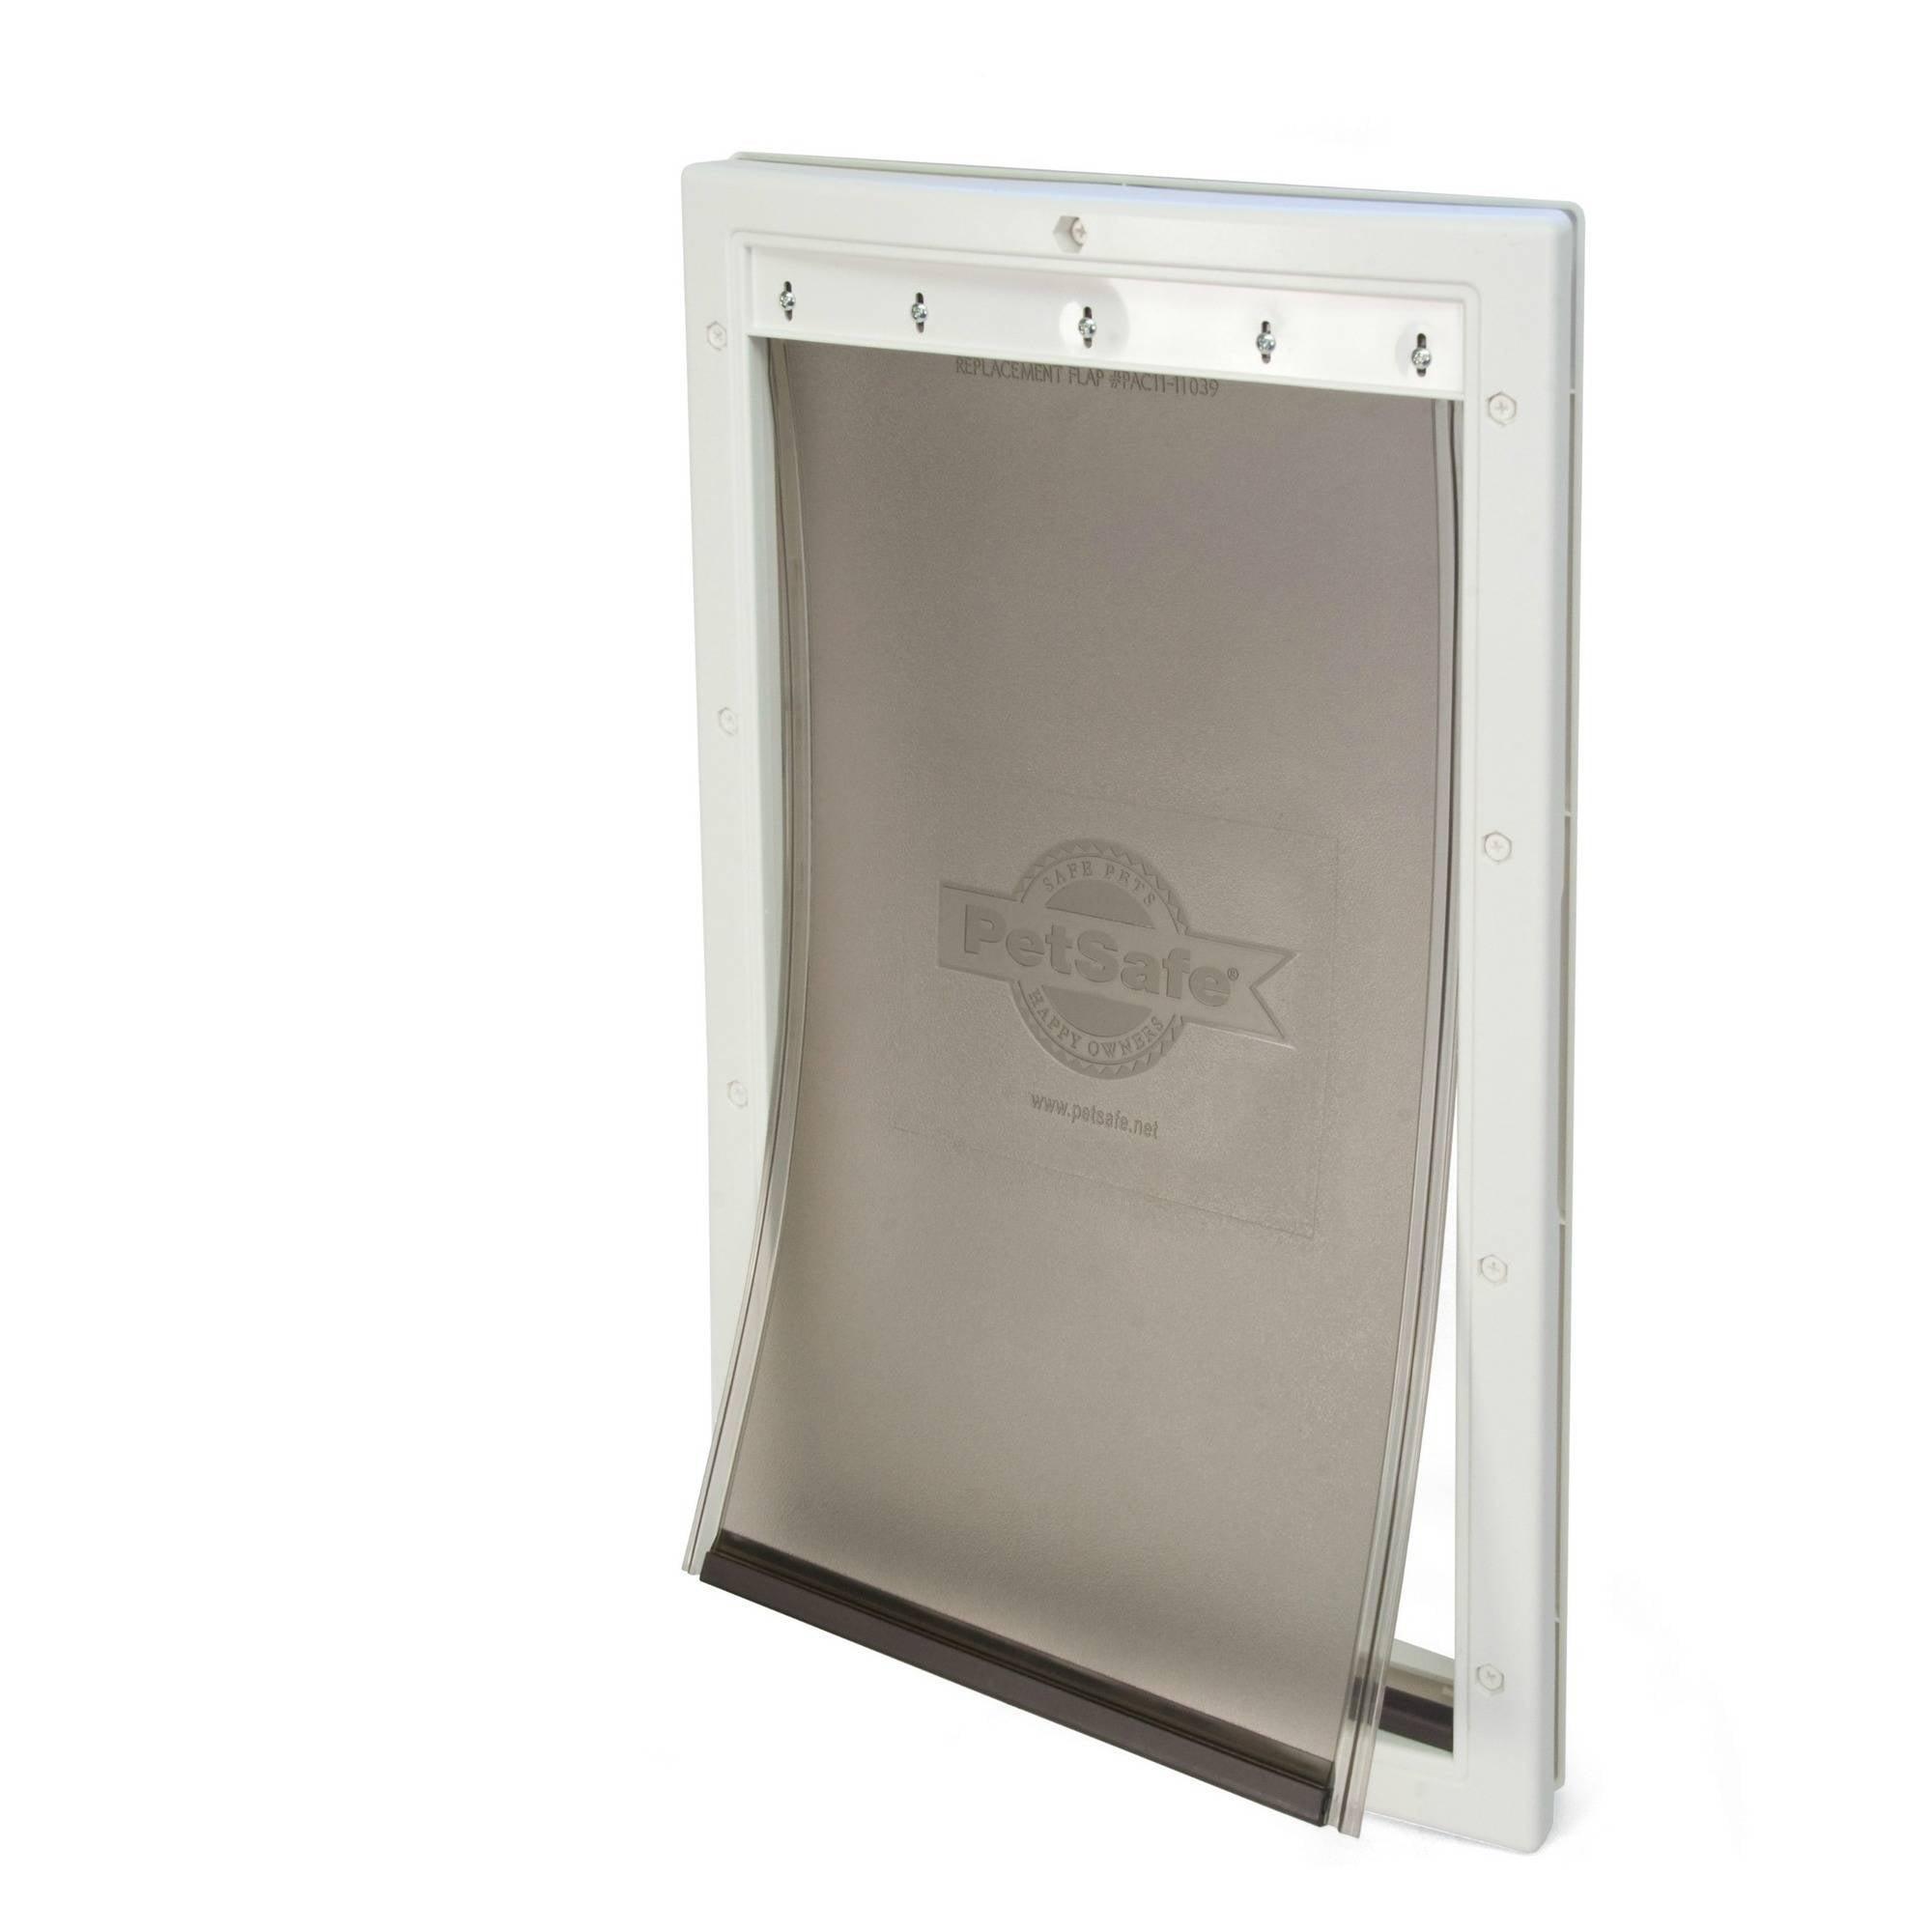 guardian by petsafe white plastic pet door large for pets to 100 lbs - Doggie Door